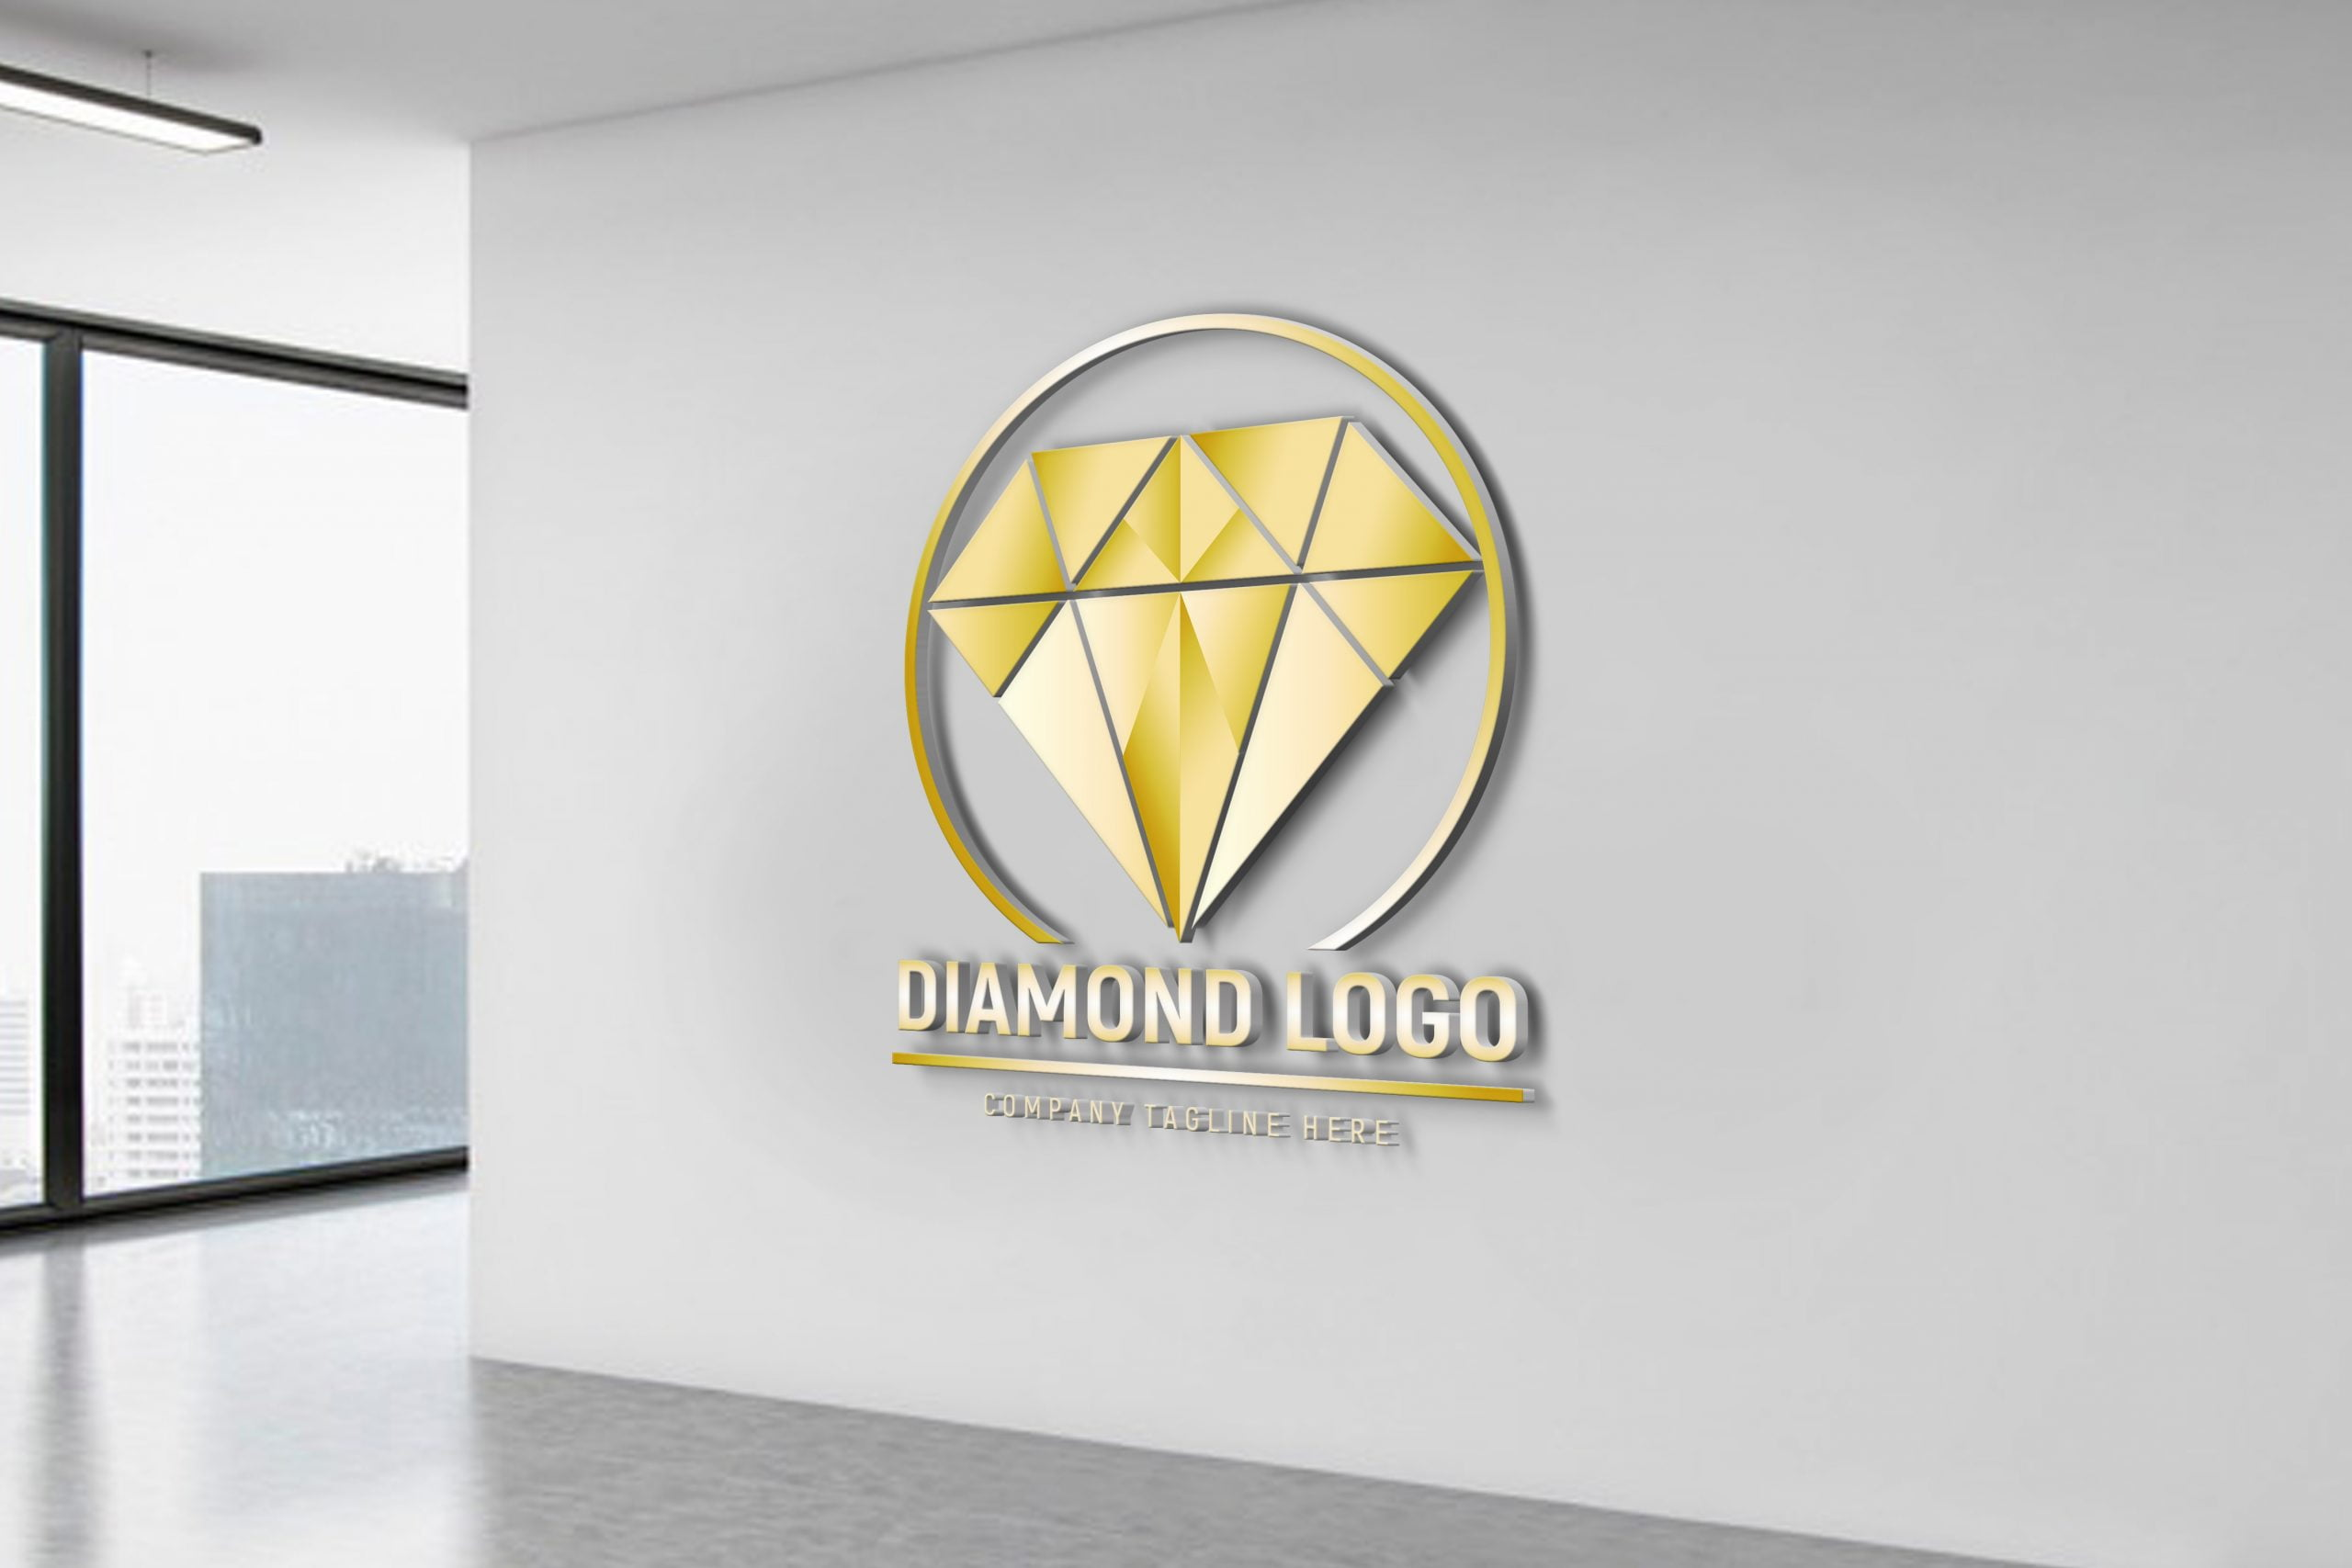 Free Download Editable Diamond Logo Design